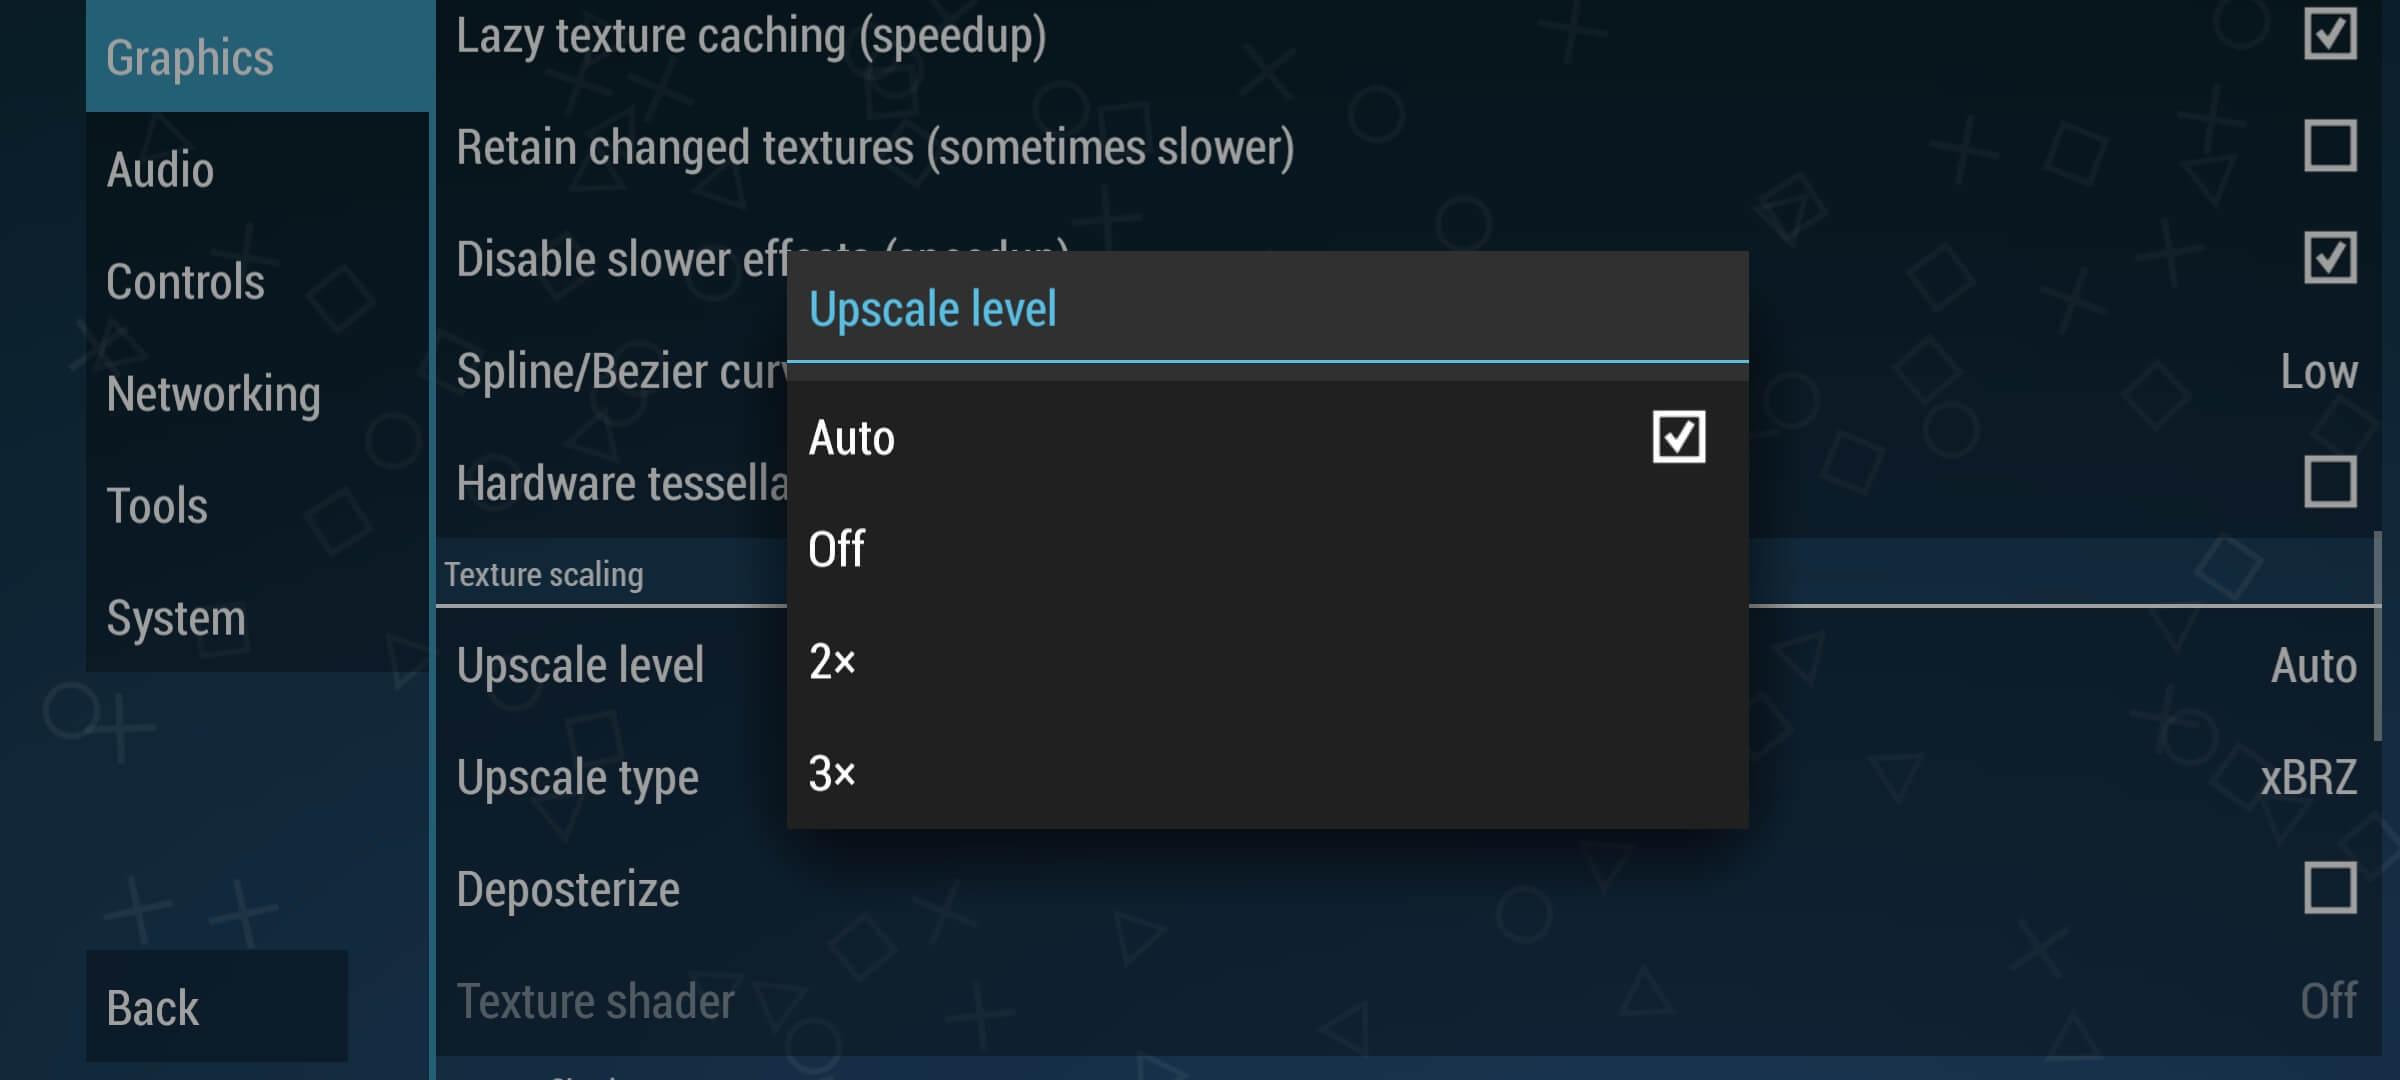 Set upscale level to auto